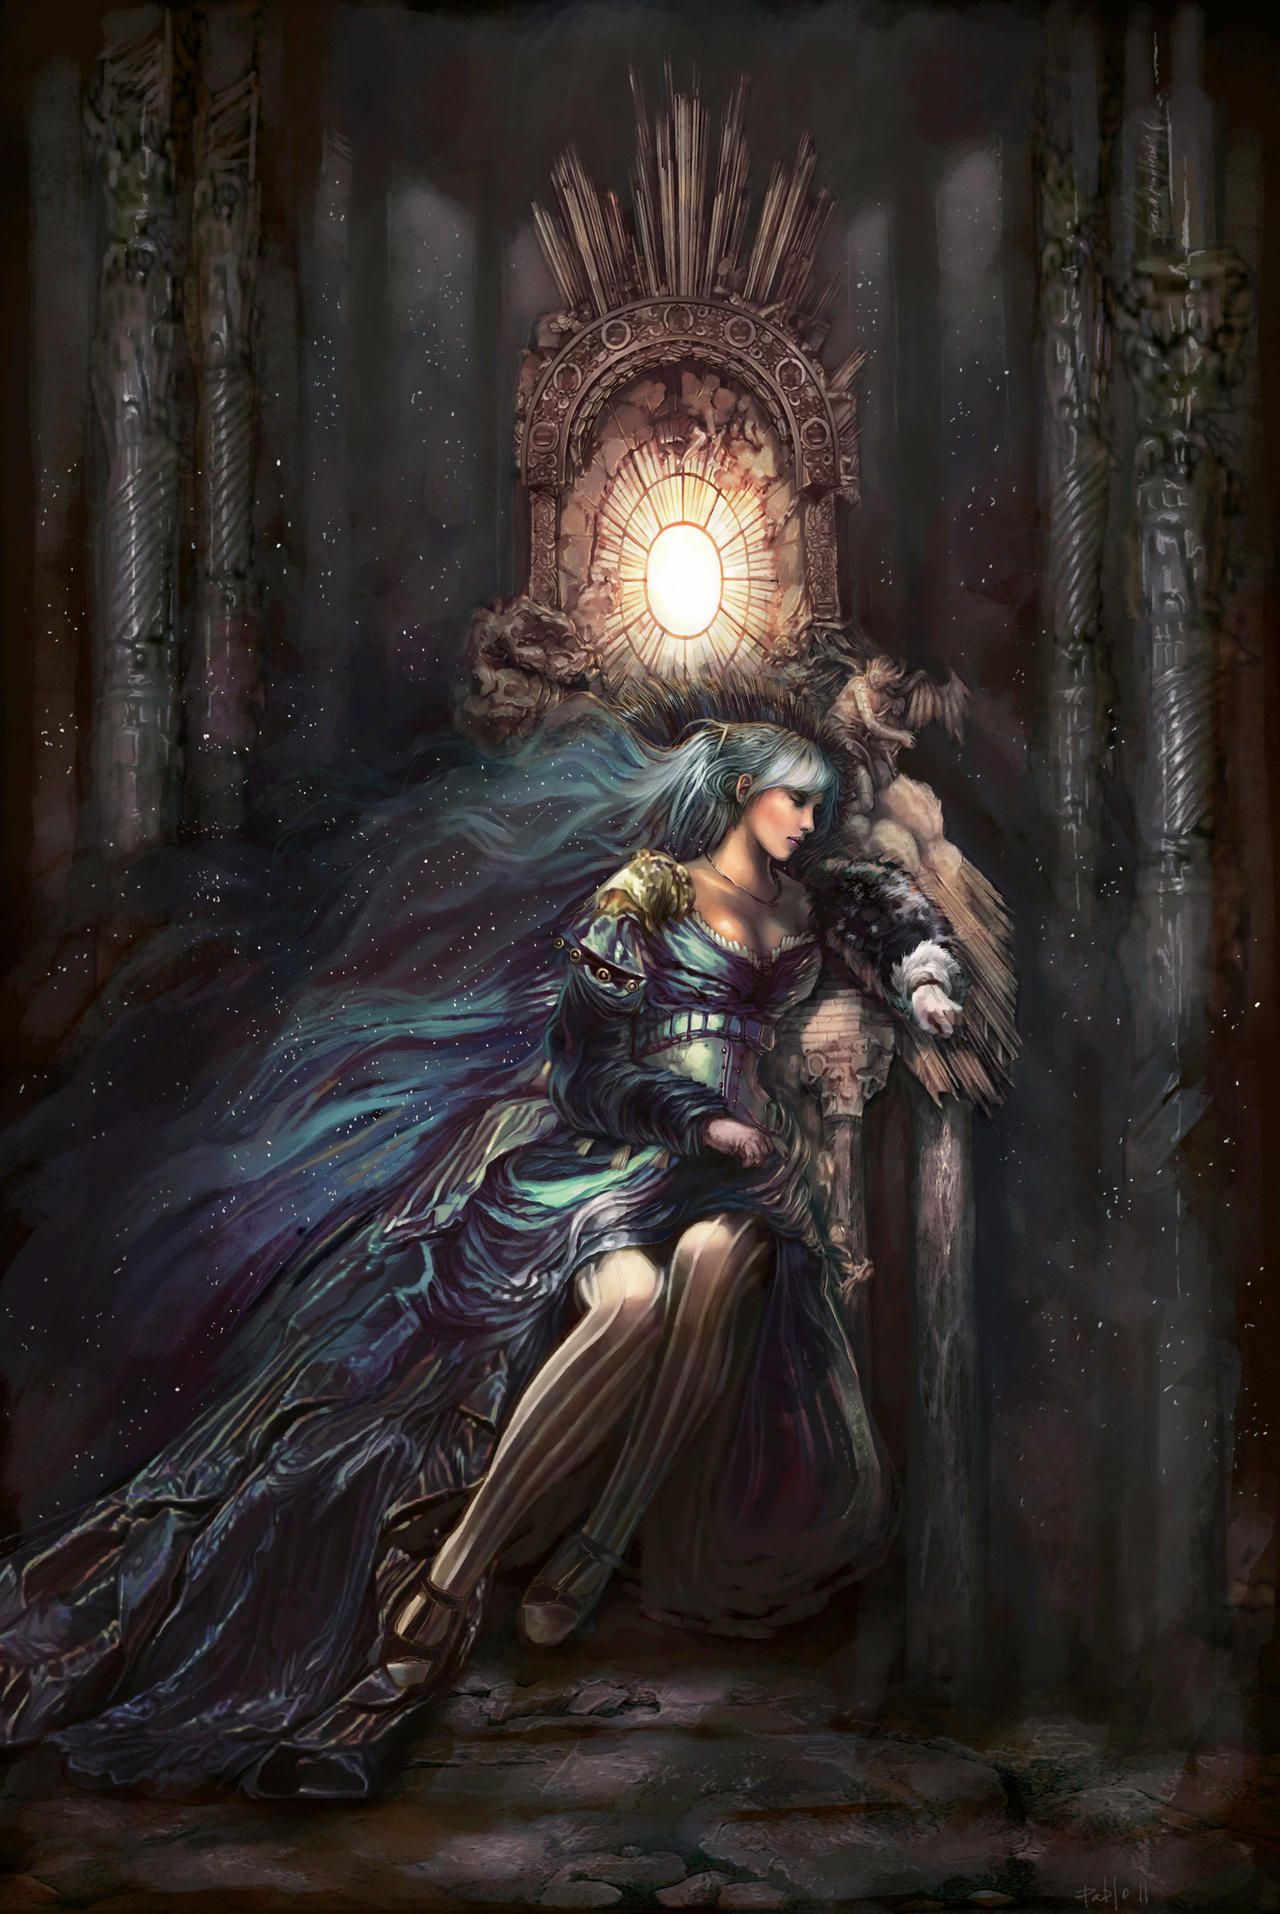 THRONE: Queen of the night by PabloFernandezArtwrk